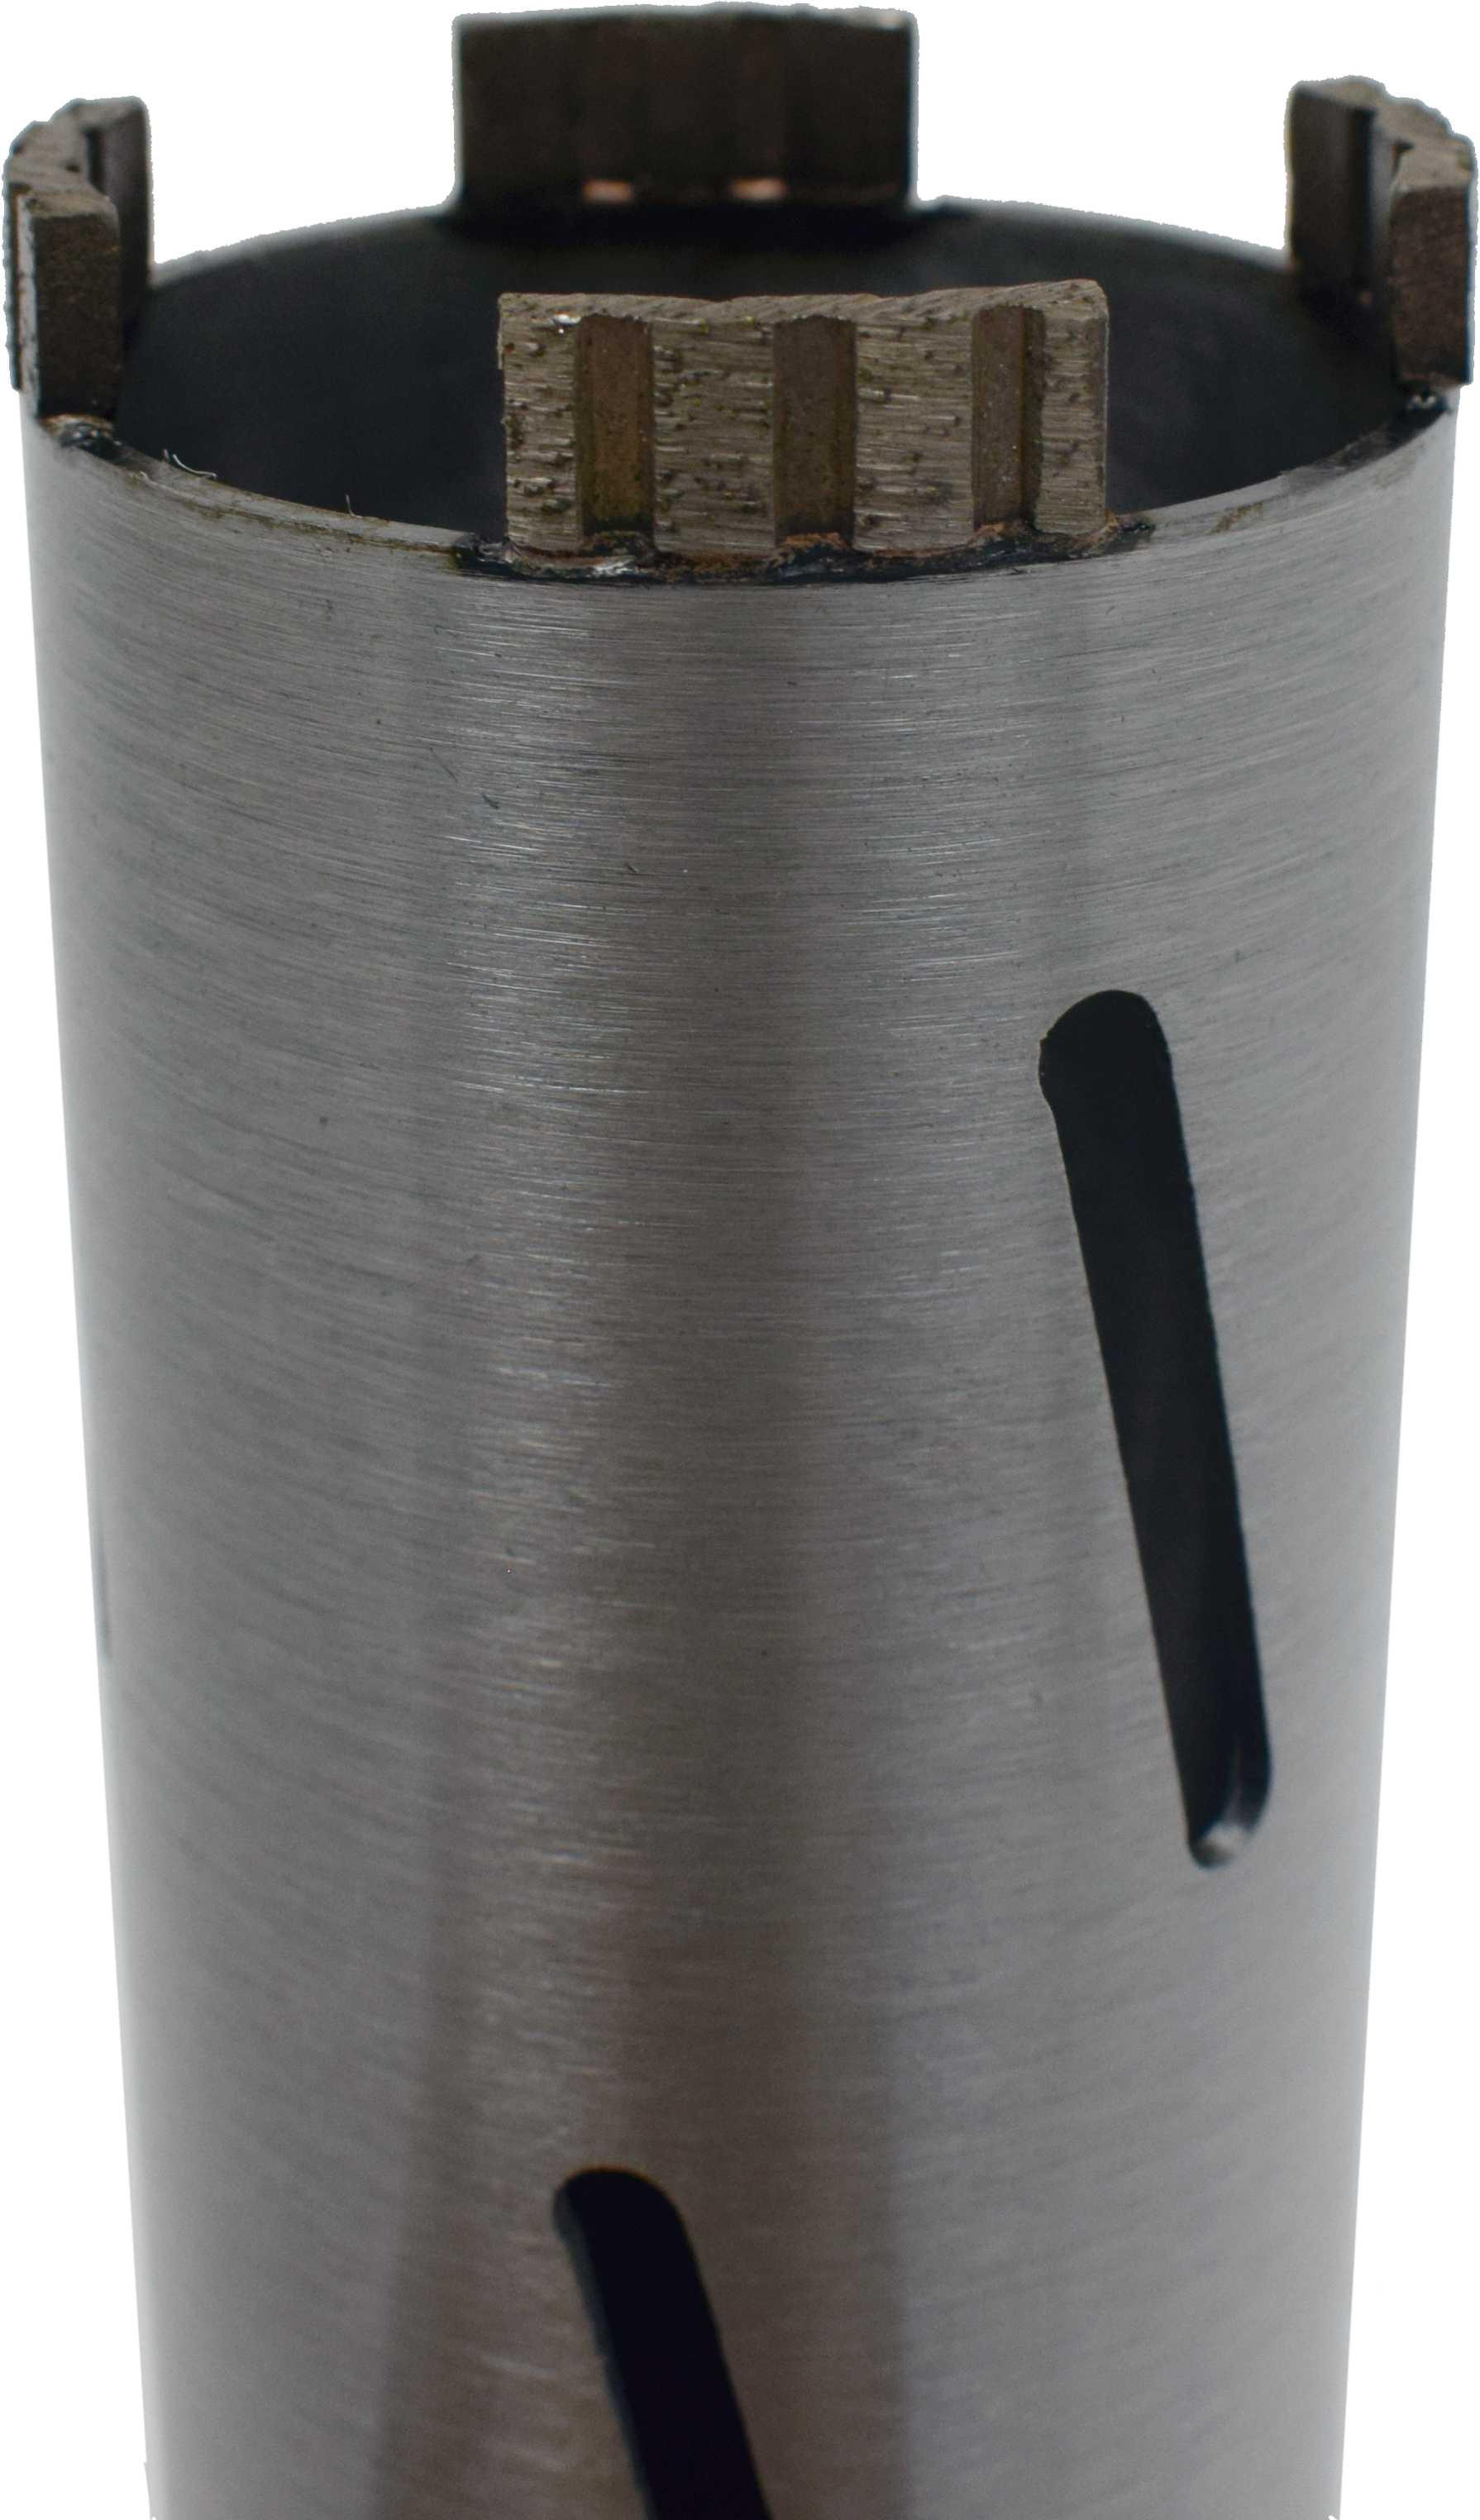 kwb Profi Hammertacker HT 057 befestigt Tacker-Klammern schnell /& stark Alternative zur elektrischen Tacker-Pistole Tacker-Ger/ät mit Handtacker-Funktion